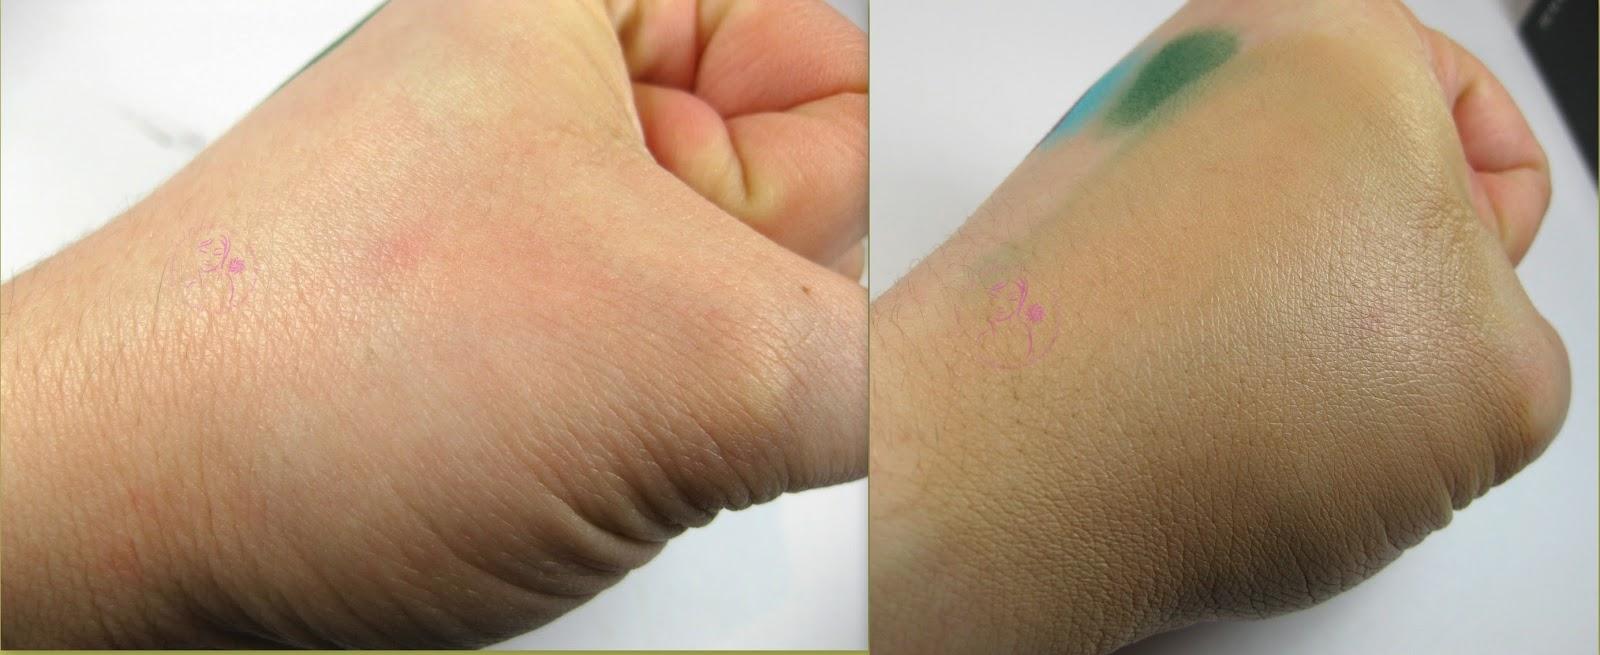 Labo Make-Up - Fashion Treatment BB Cream n° 012 - Beige - swatches a sinistra senza BB Cream - a destra con BB Cream